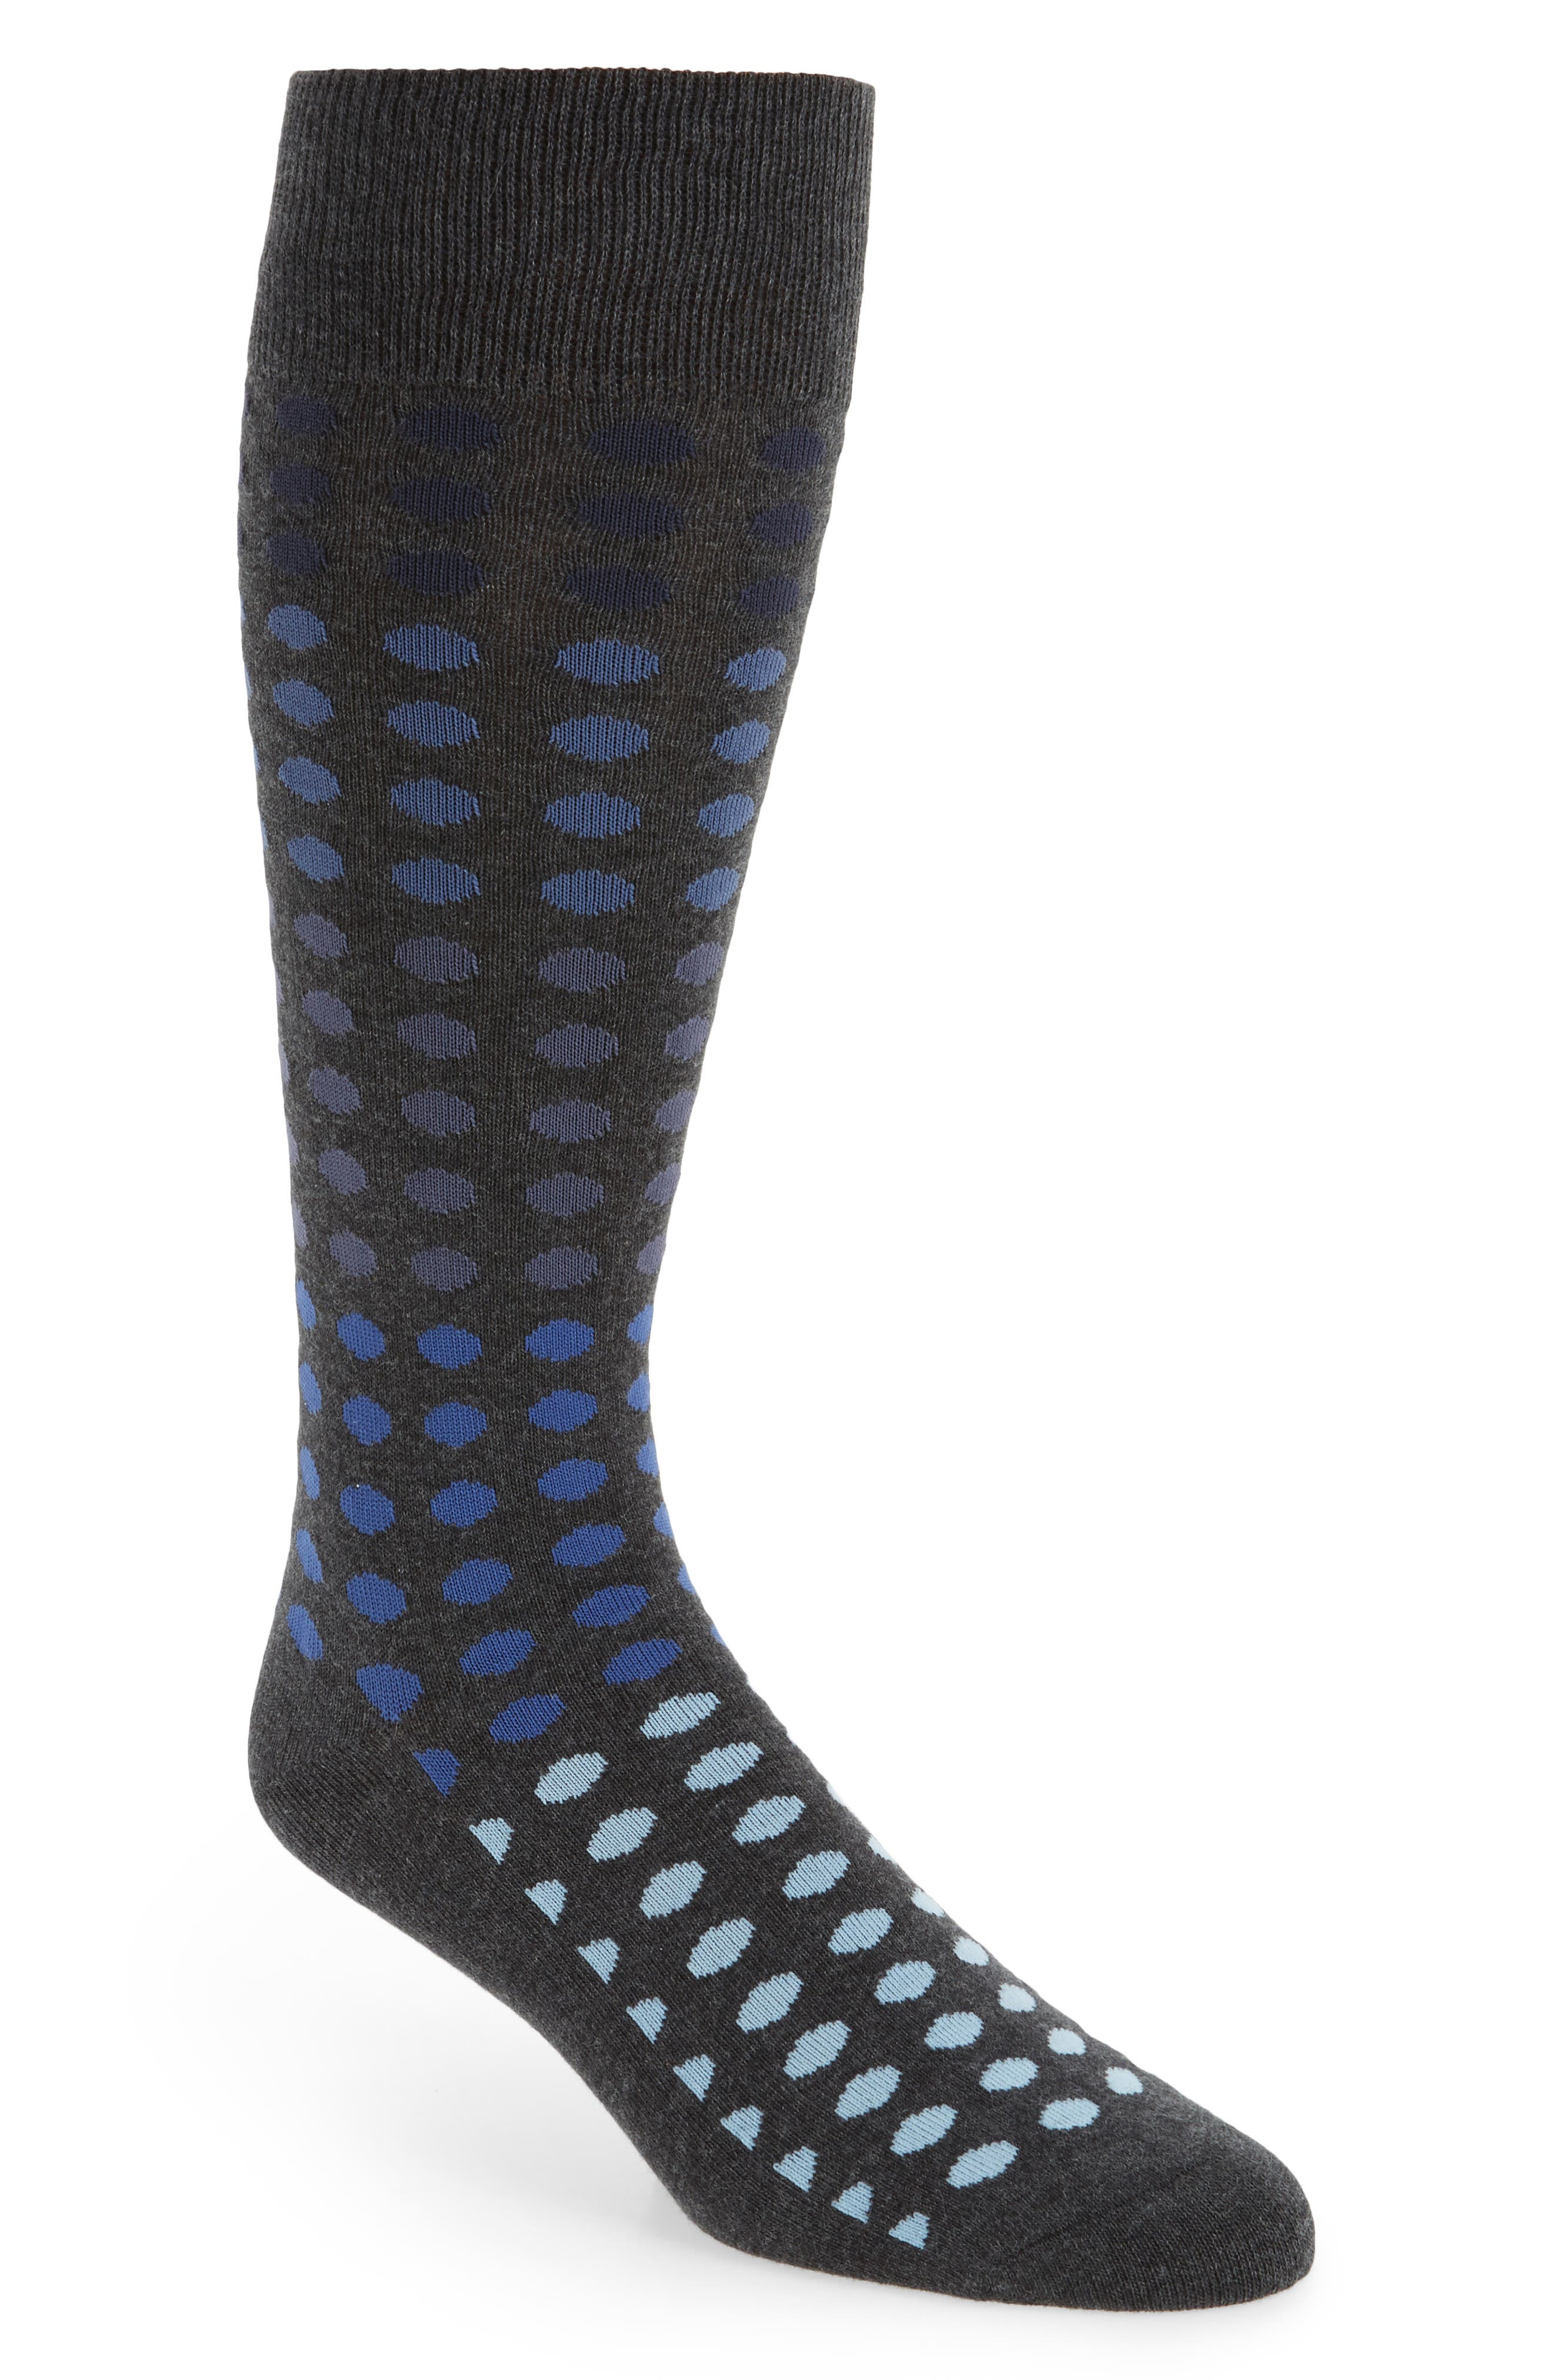 Gradient Dot Socks,                         Main,                         color, Charcoal Heather